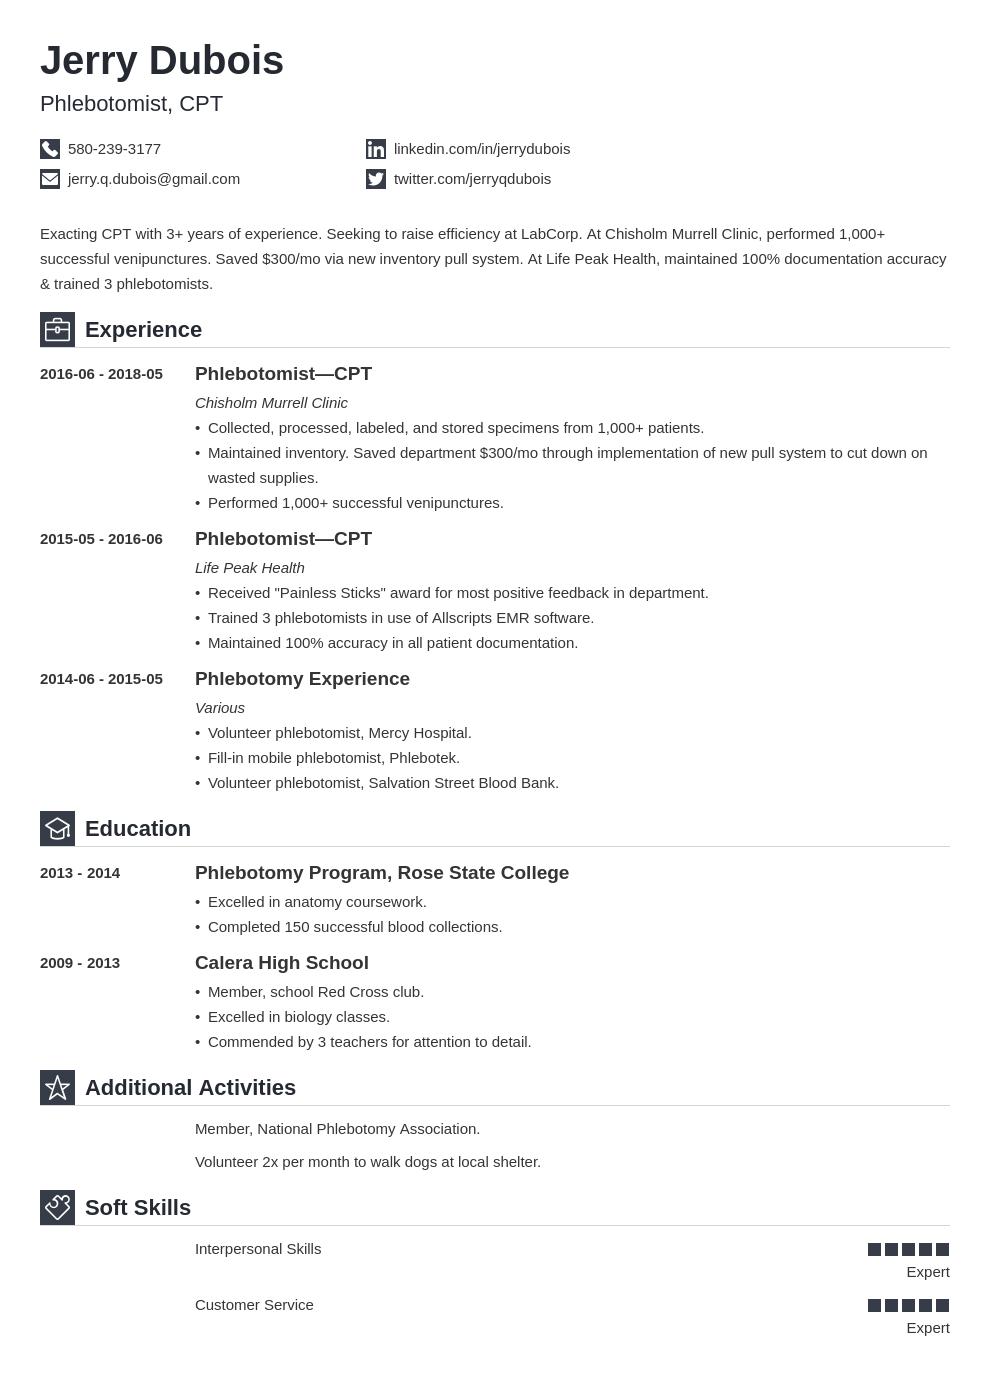 Phlebotomy Resume Example Template Iconic Resume Examples Phlebotomy Resume